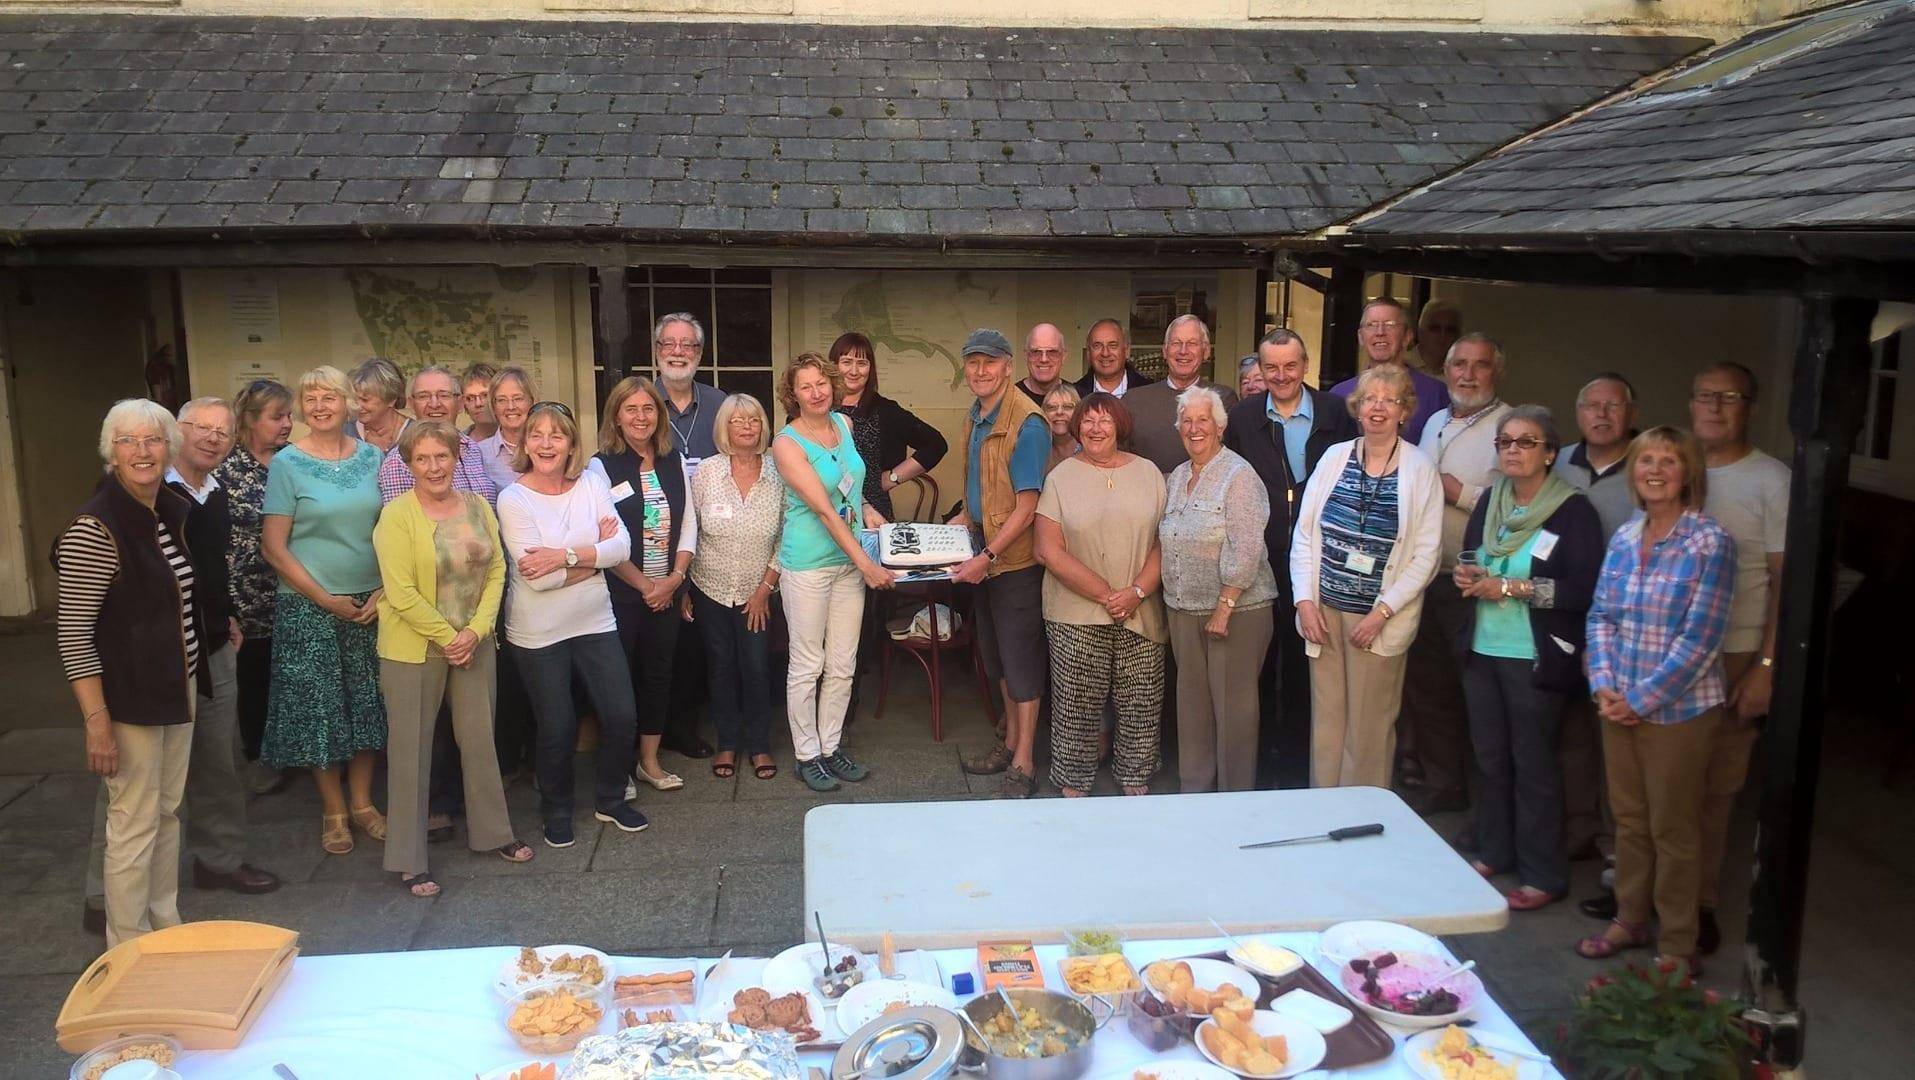 Celebrating 50,000 volunteer hours at Lytham Hall